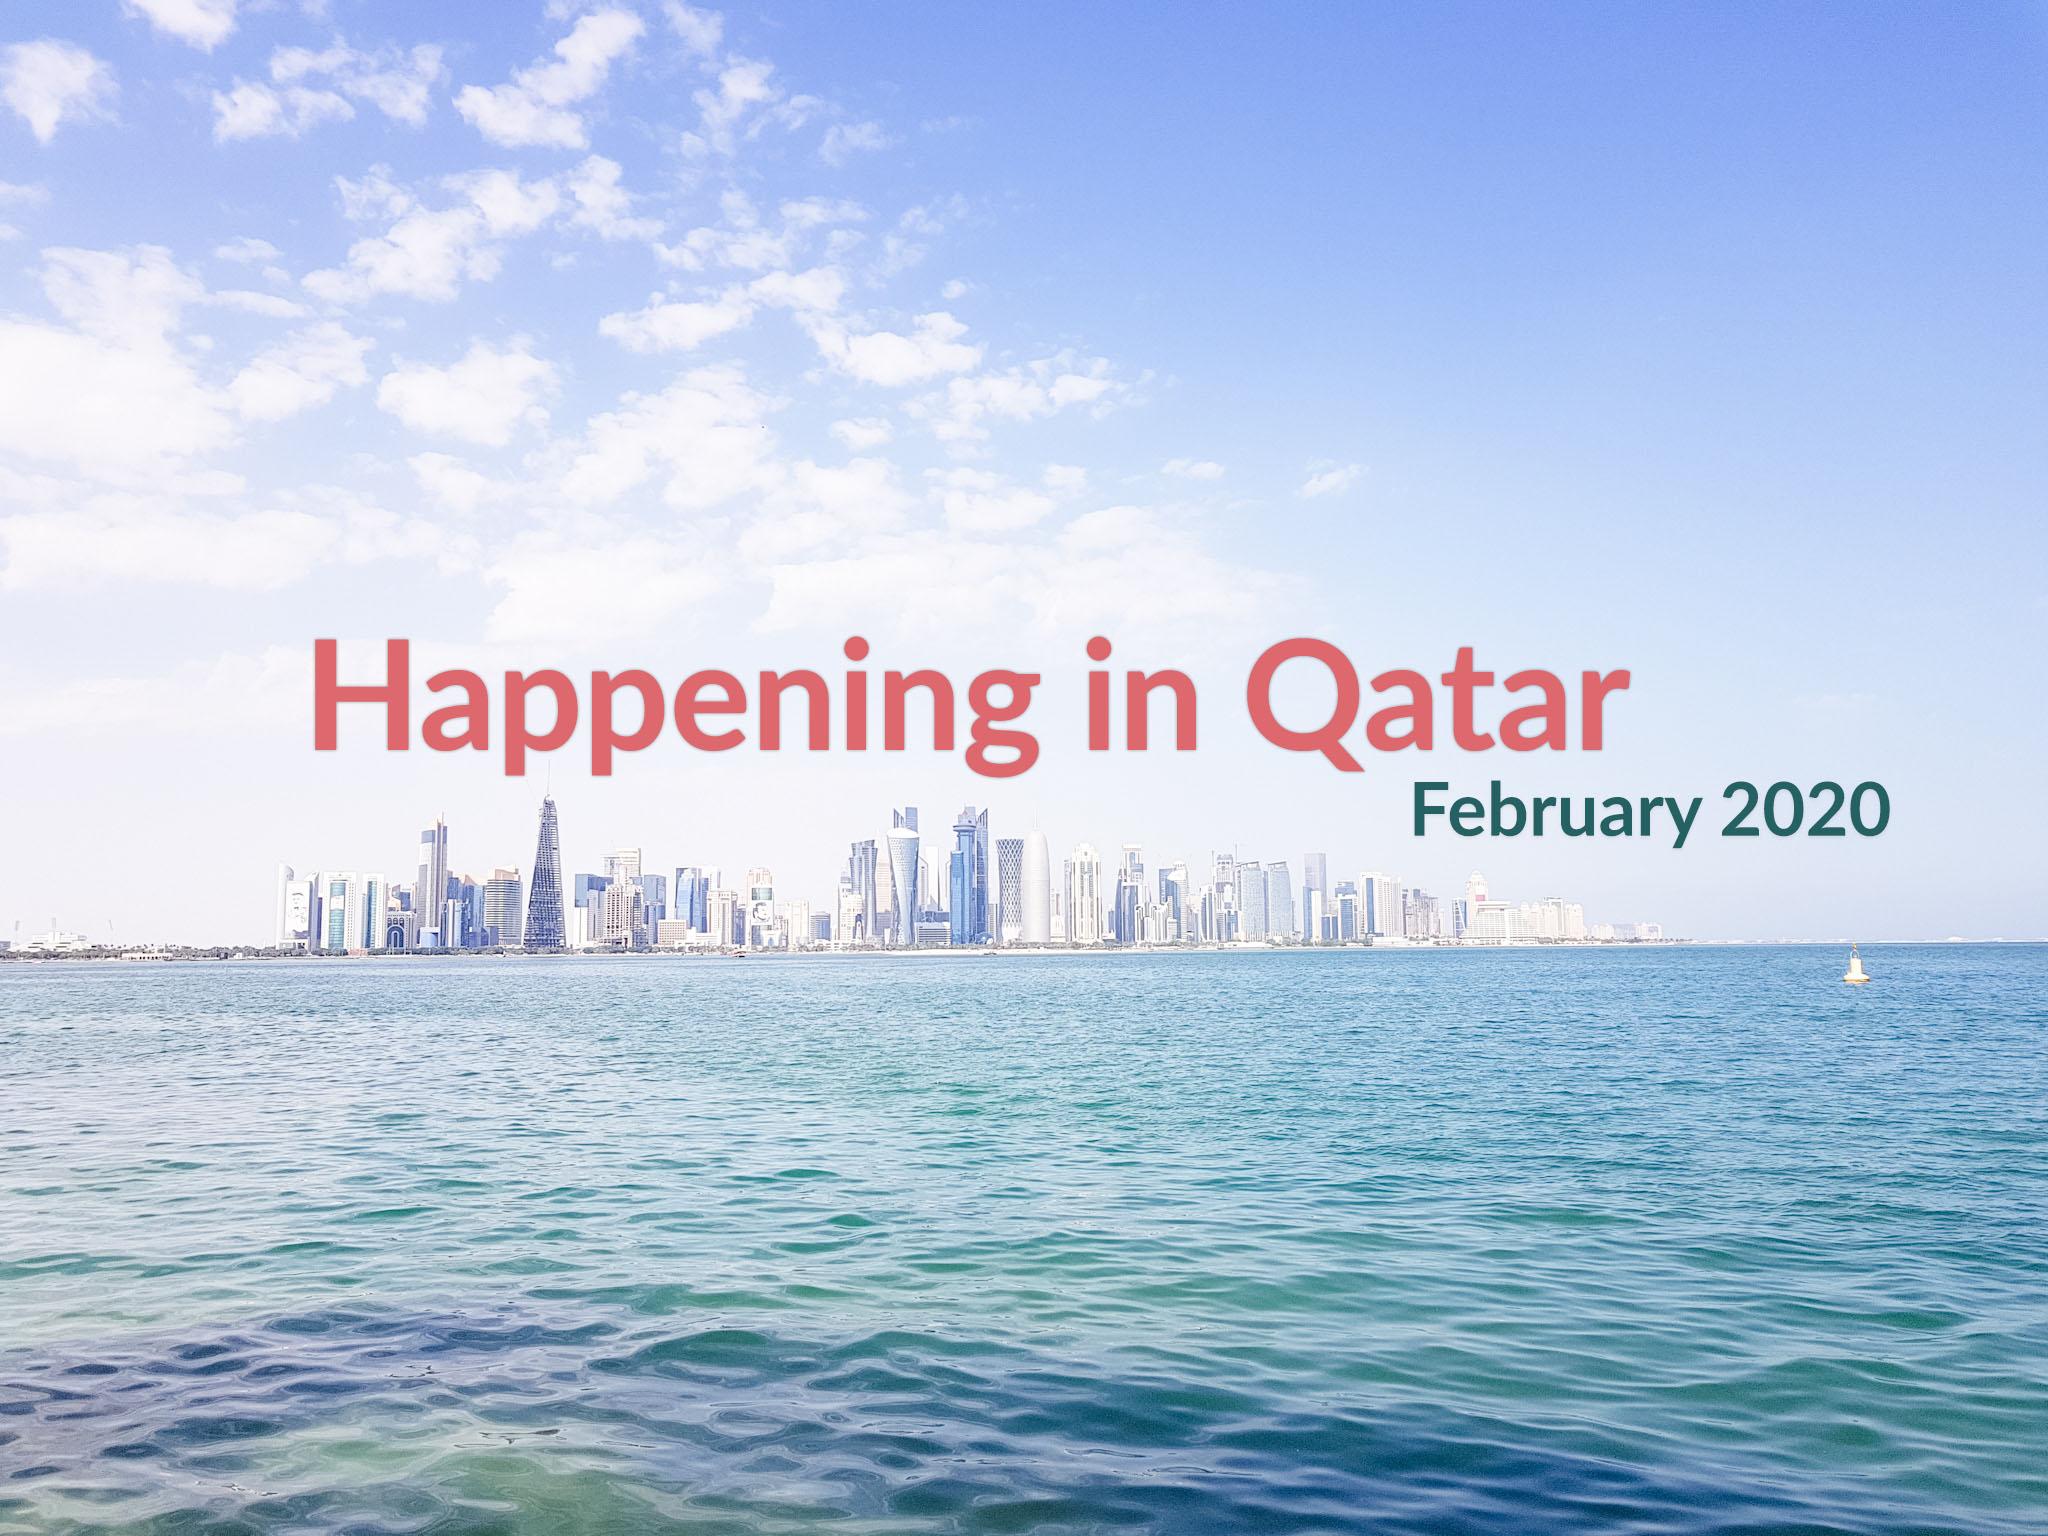 Happening in Qatar: February 2020.